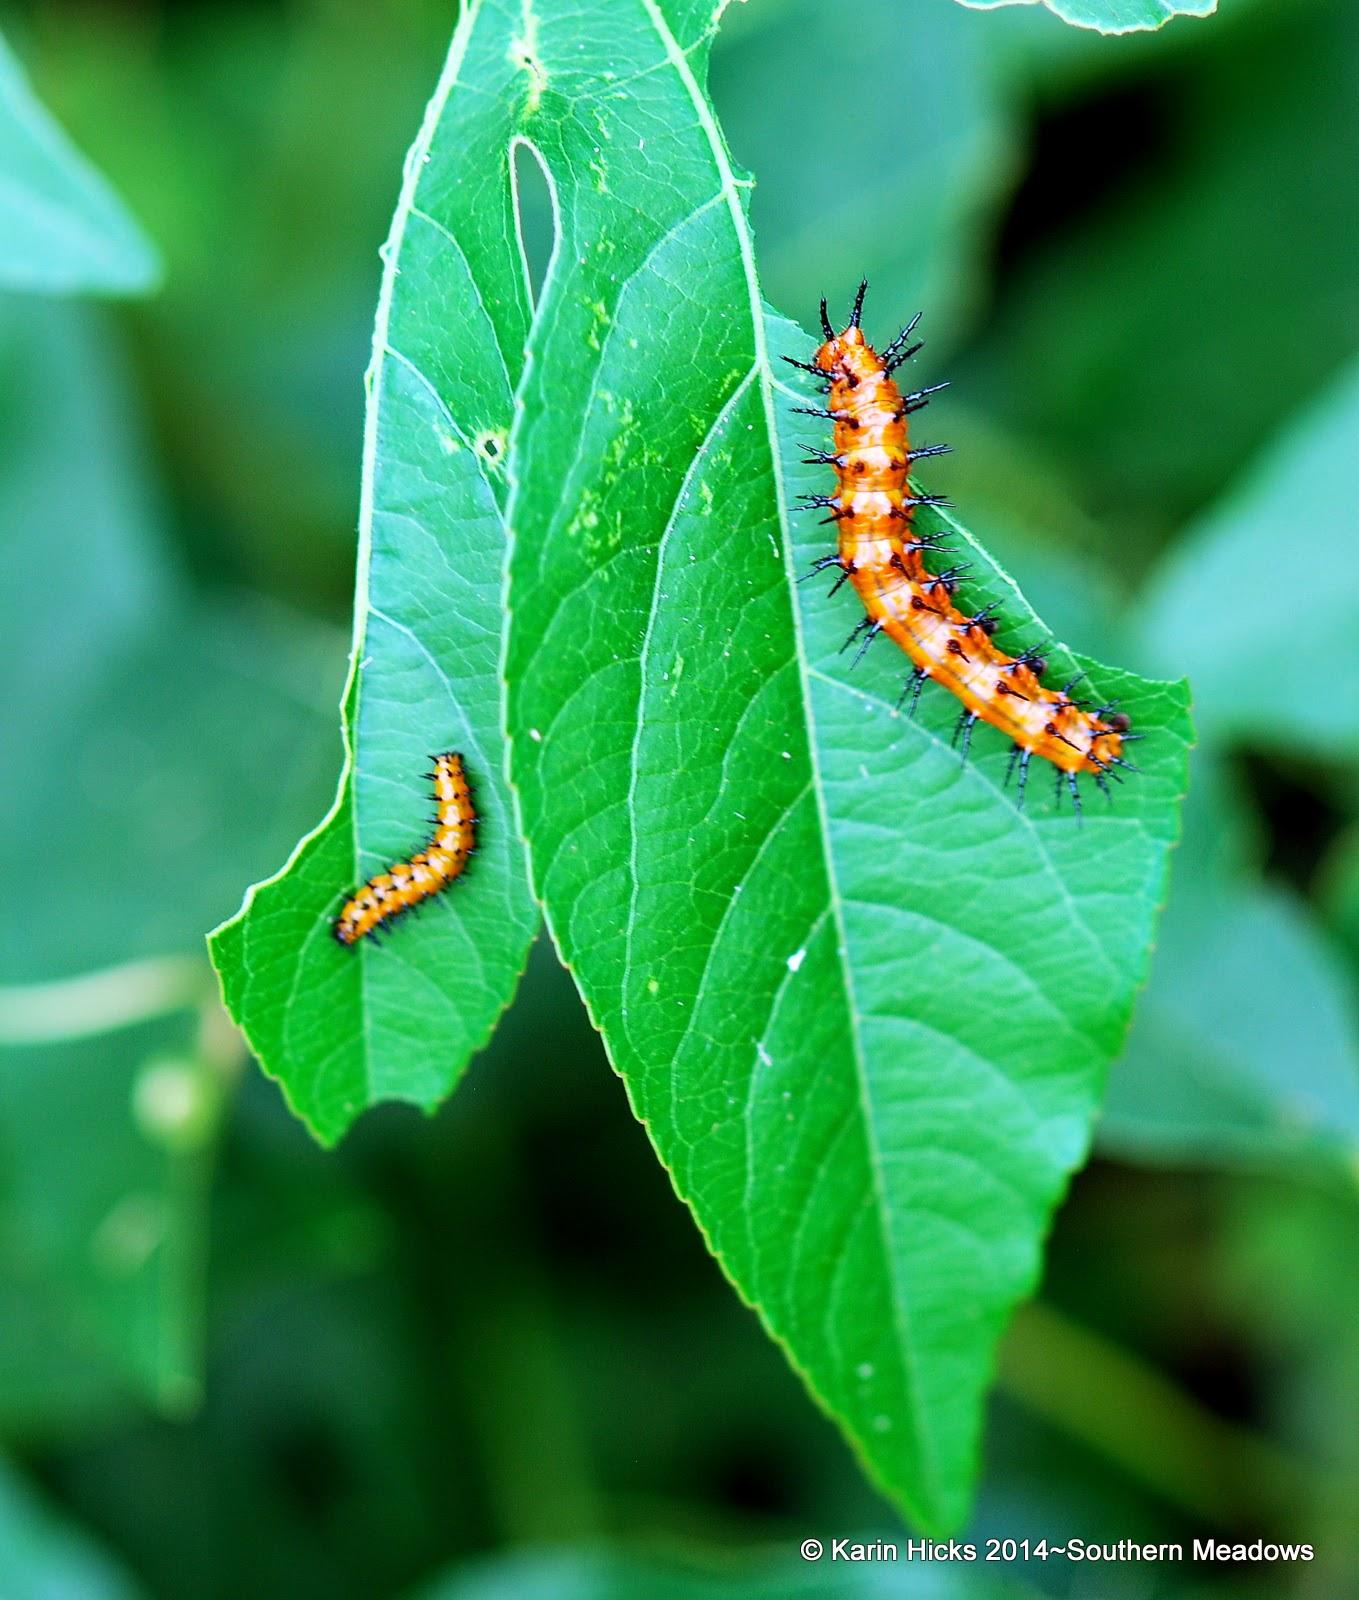 two instars of gulf fritillary caterpillars